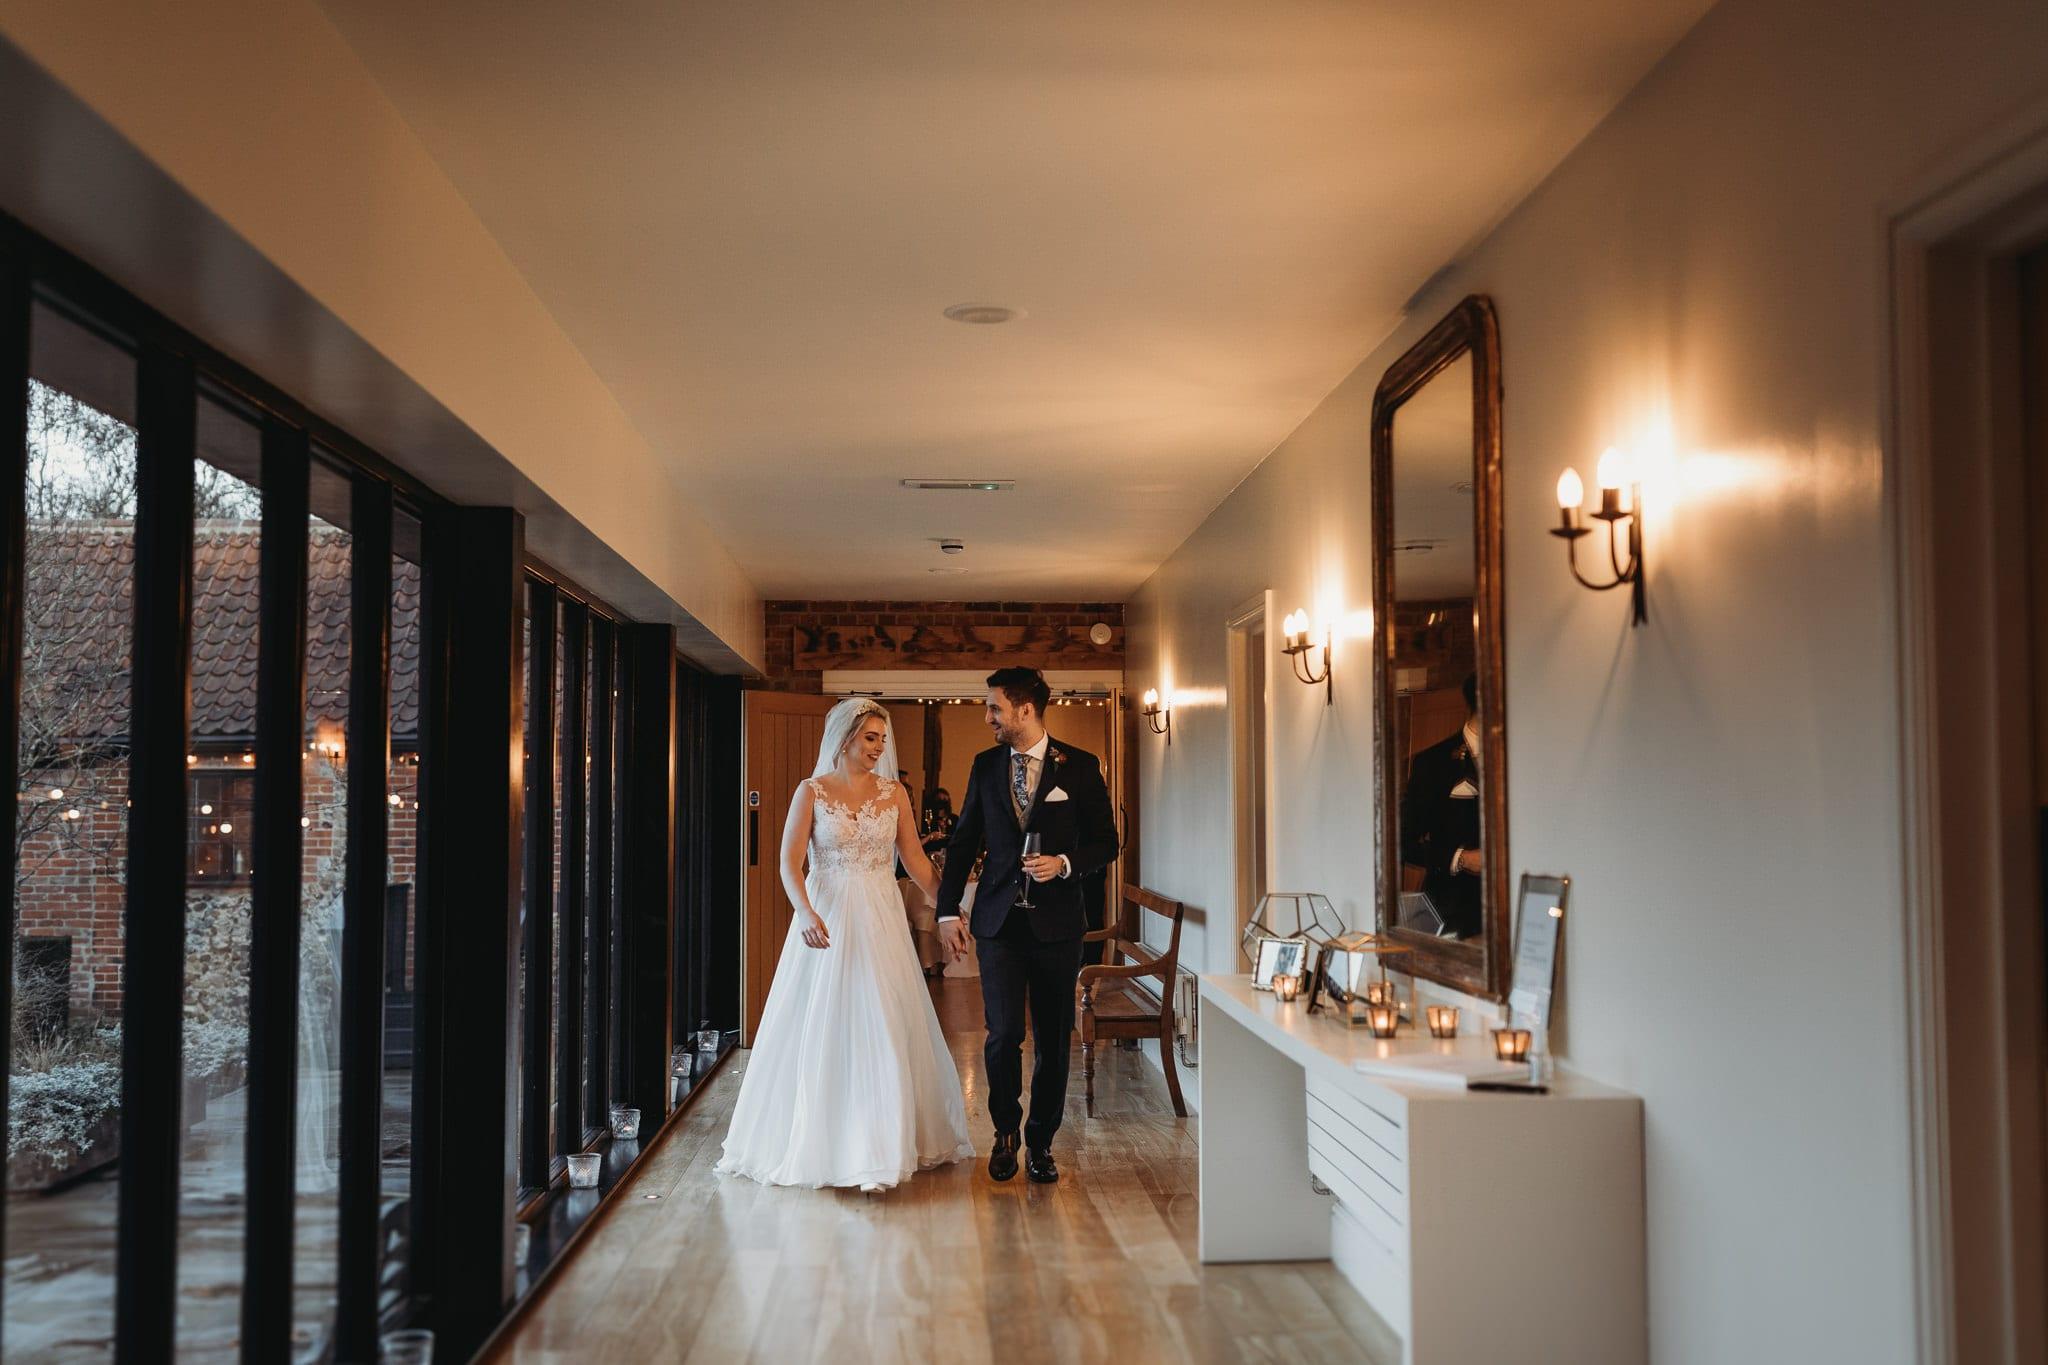 bride and groom walking on the corridor at Granary Estates Intimate wedding